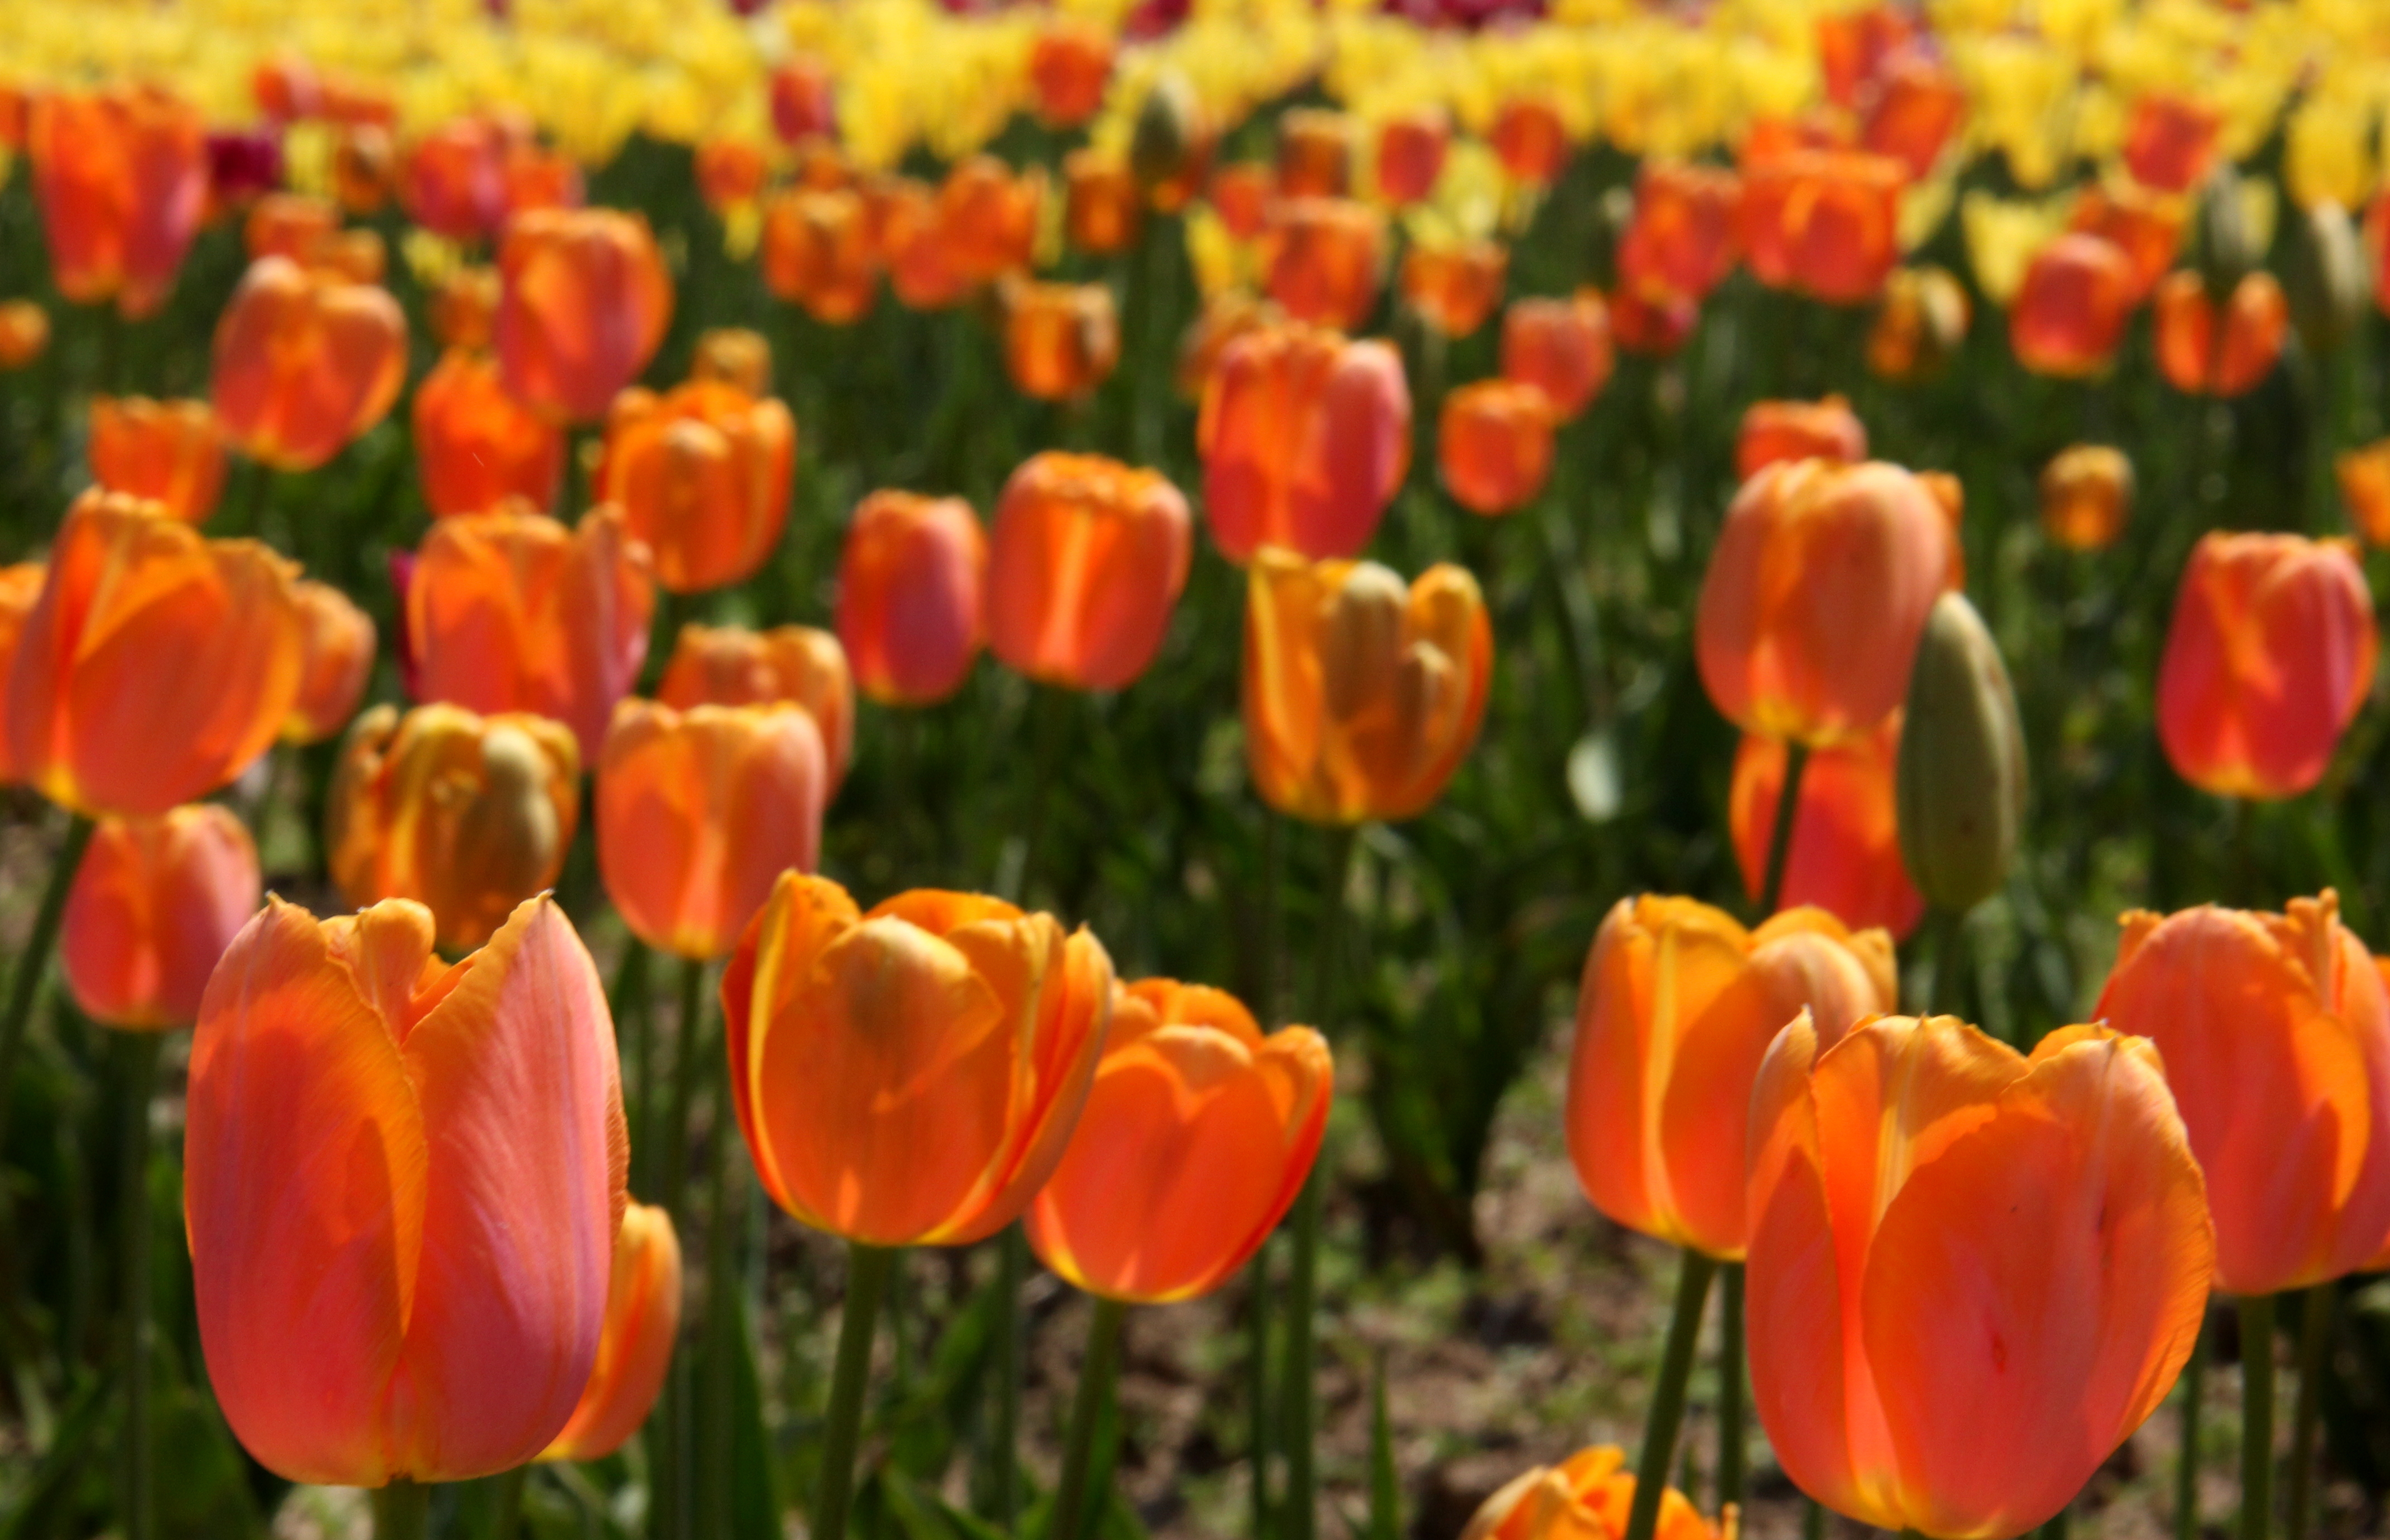 srinagar tulip festival was started in 2007